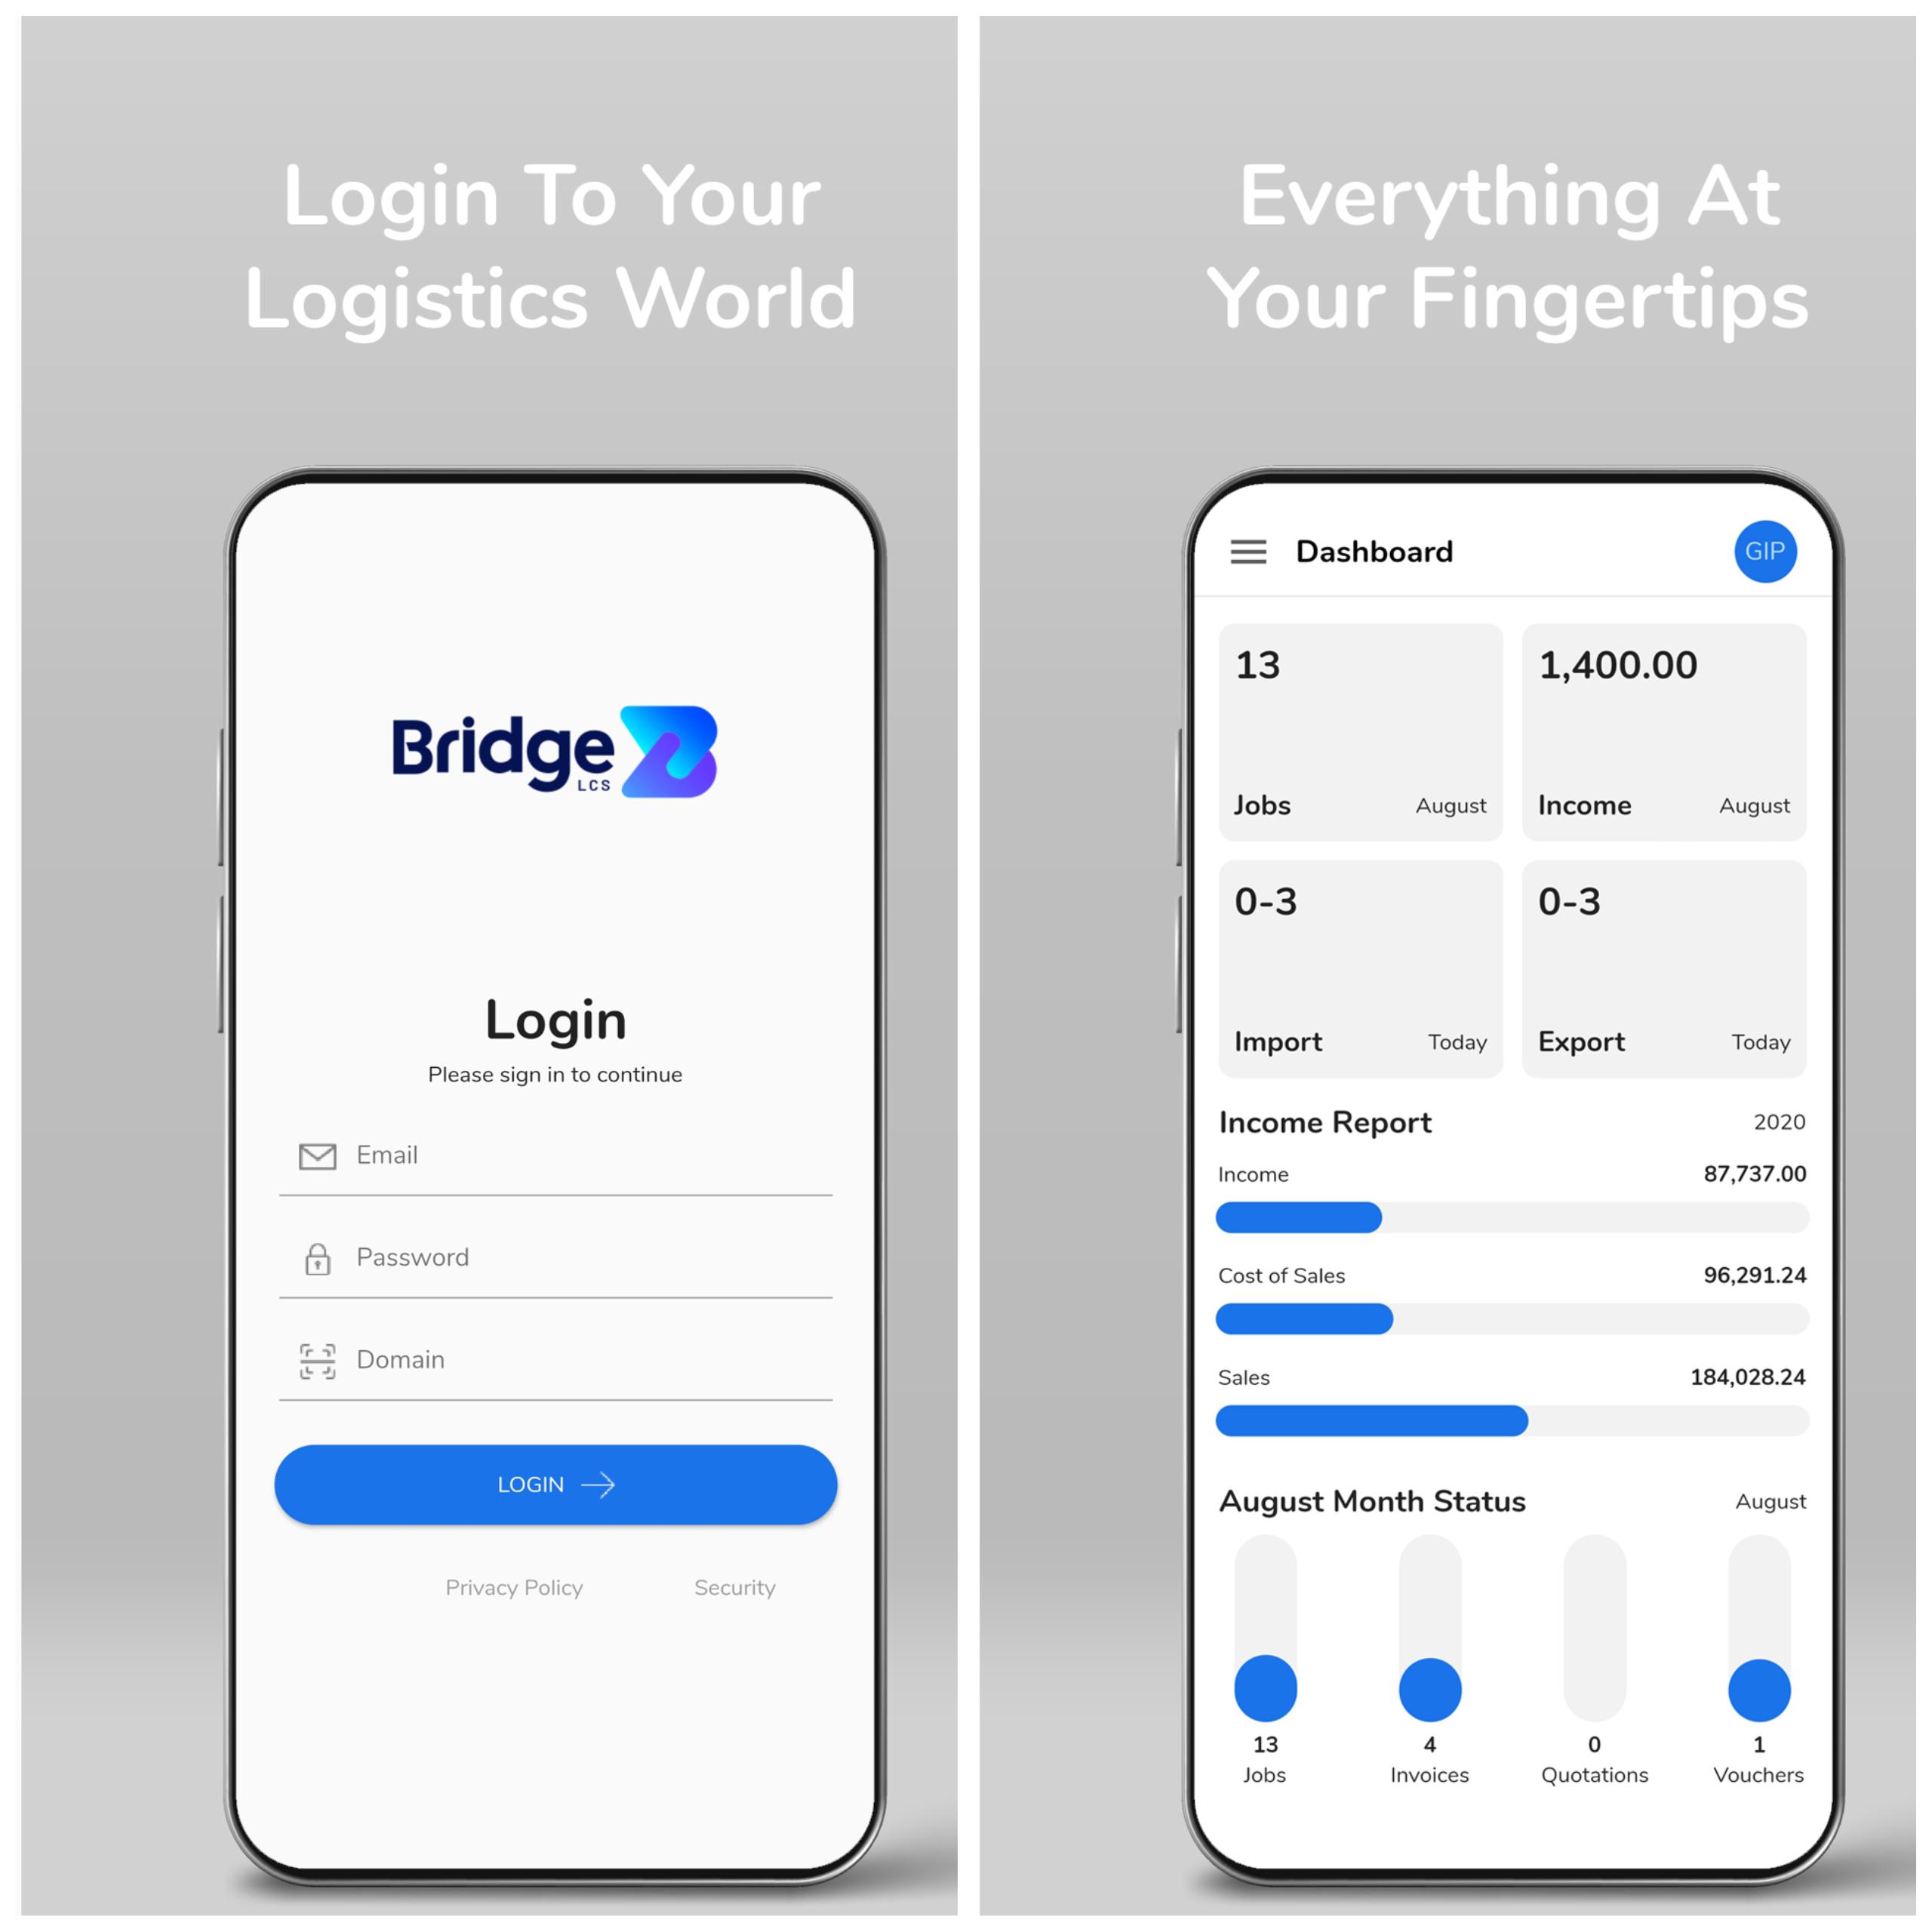 Logistics mobile app features - Login Page